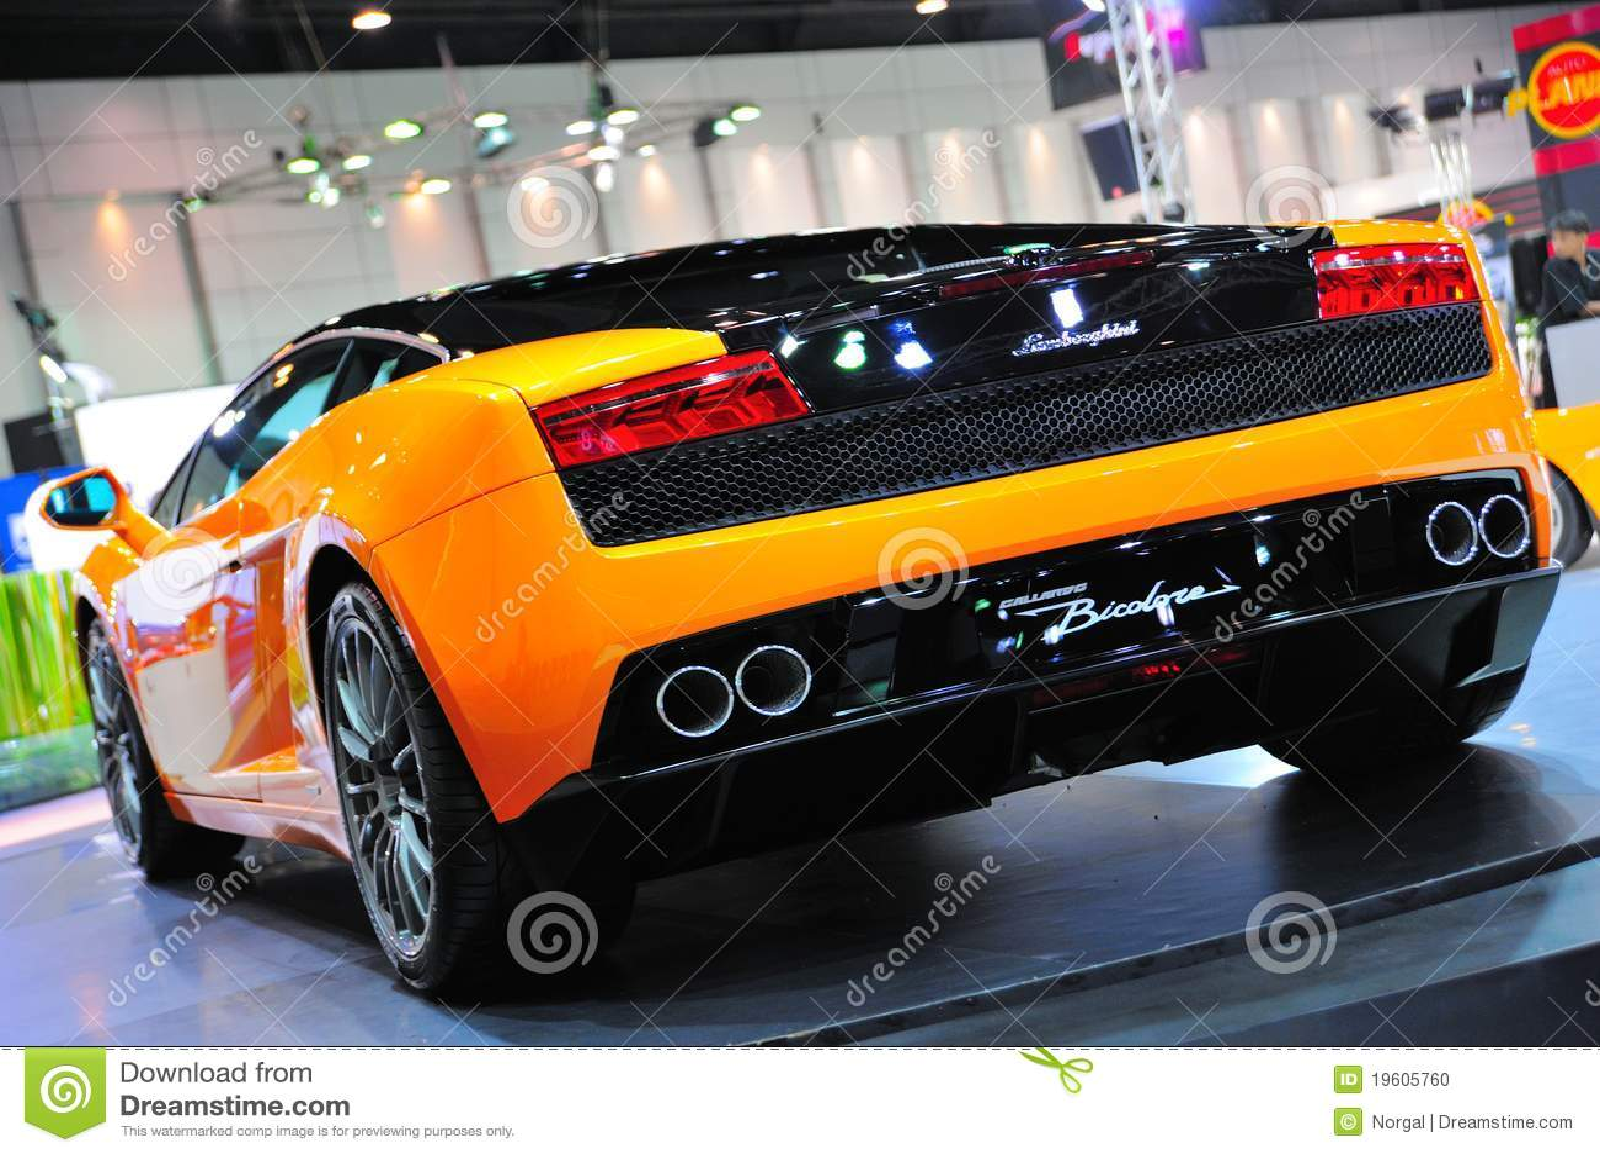 Back Of Lamborghini Gallardo Bicolore Editorial Image Image Of